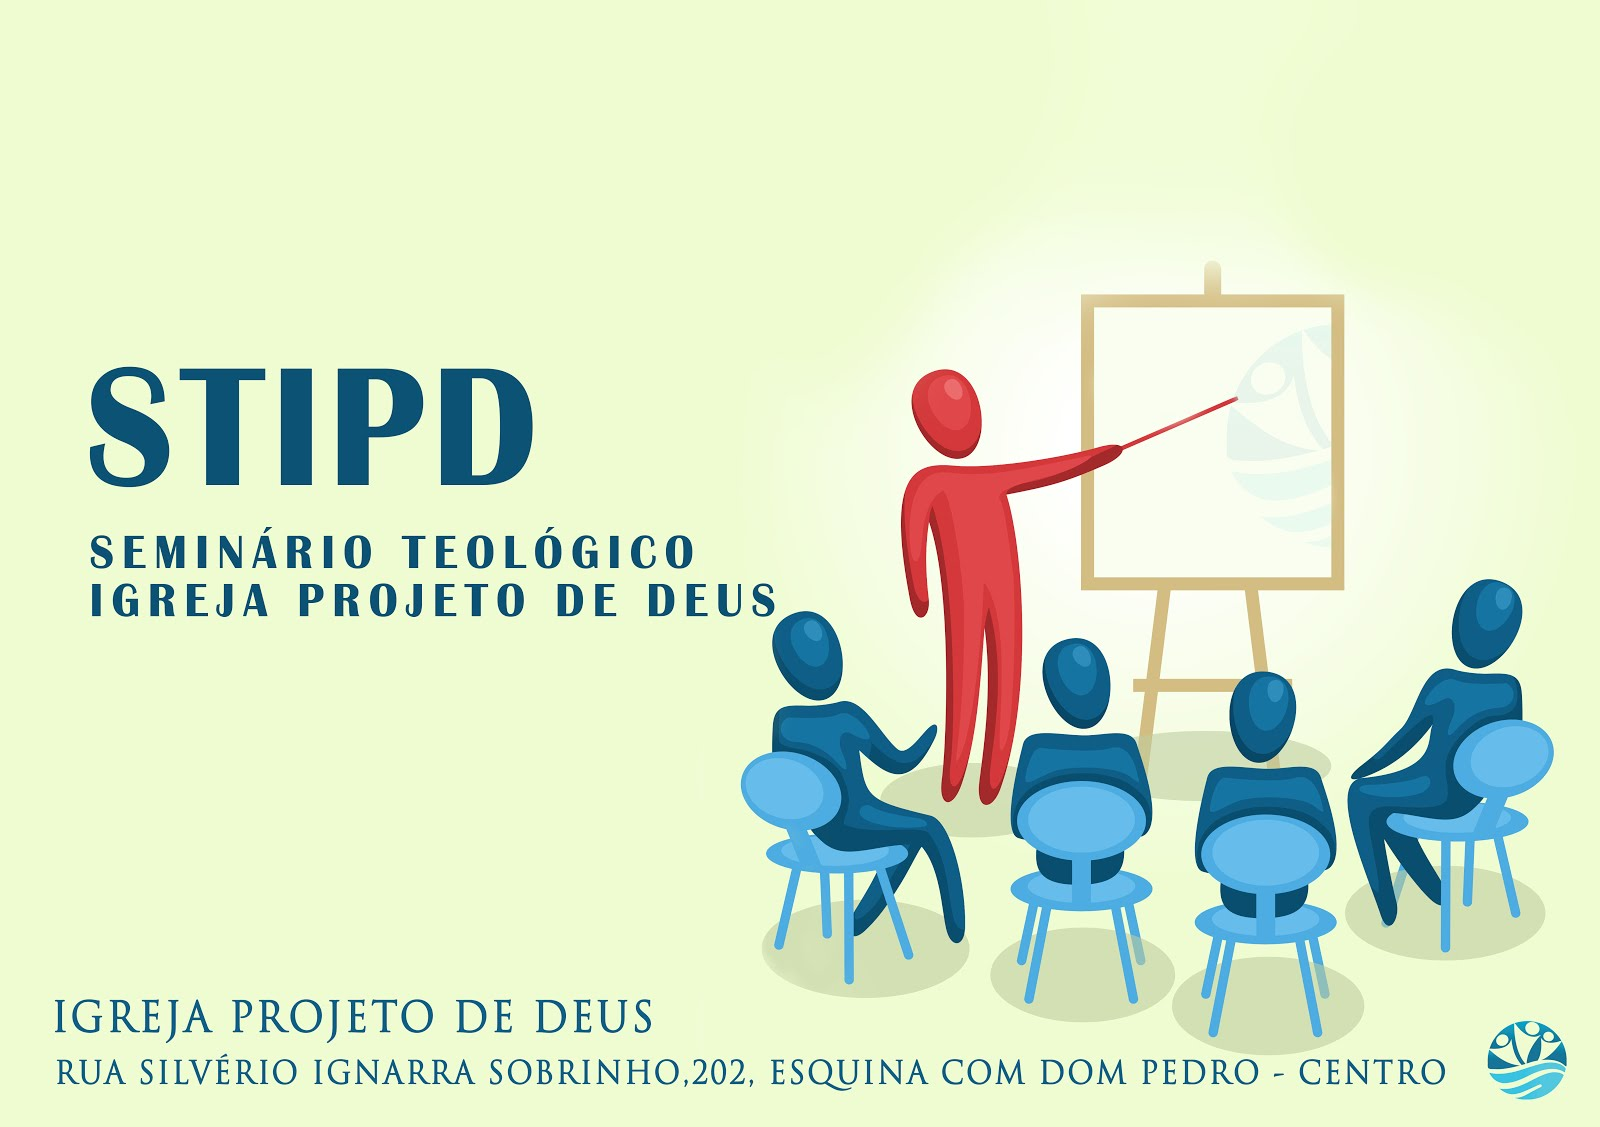 ST - IPD